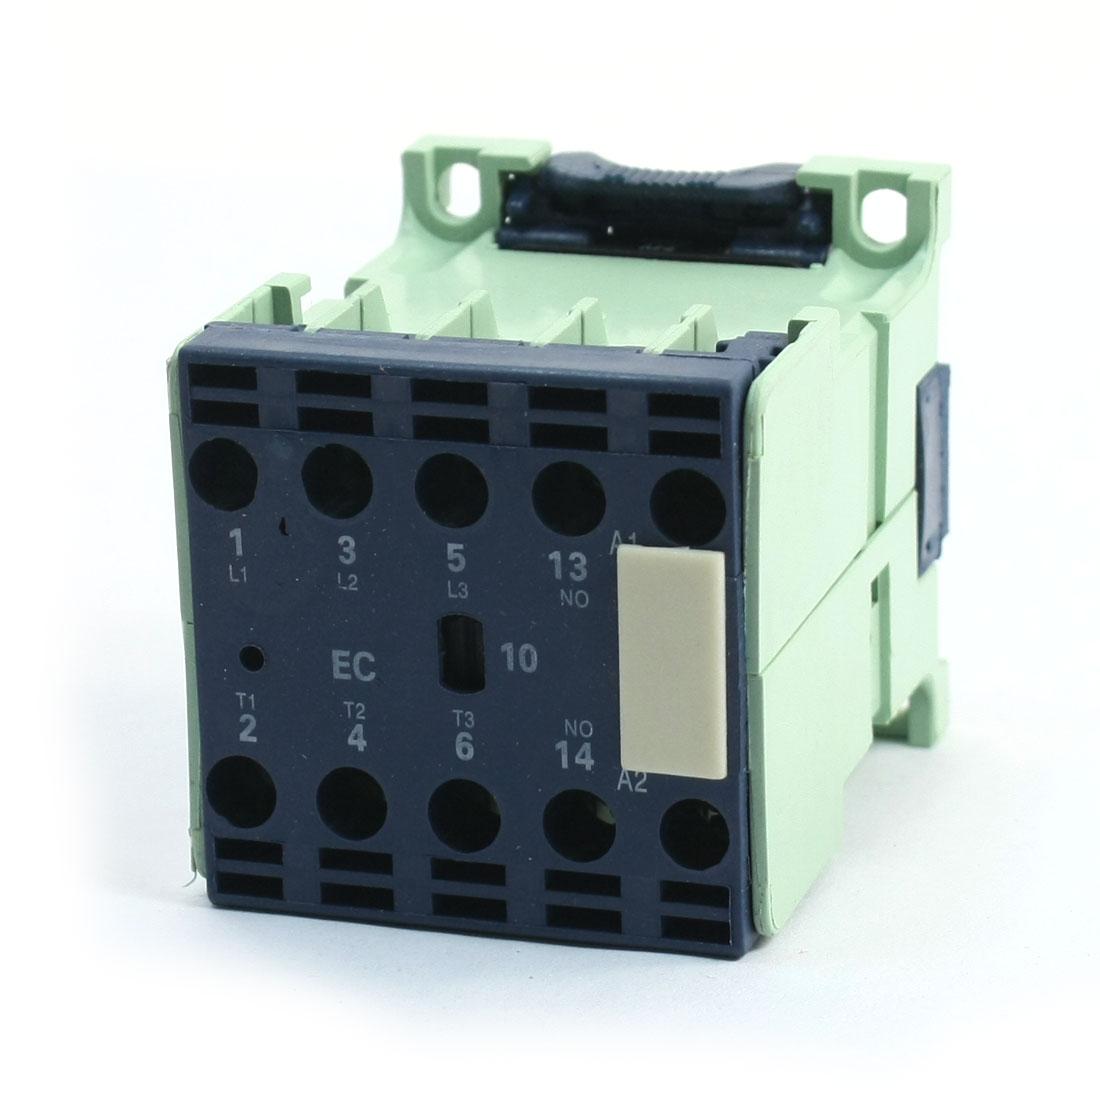 CJX2-0910E 3 Poles 3P 1NO 40mmx35mm DIN Rail AC Contactor 24V Coil